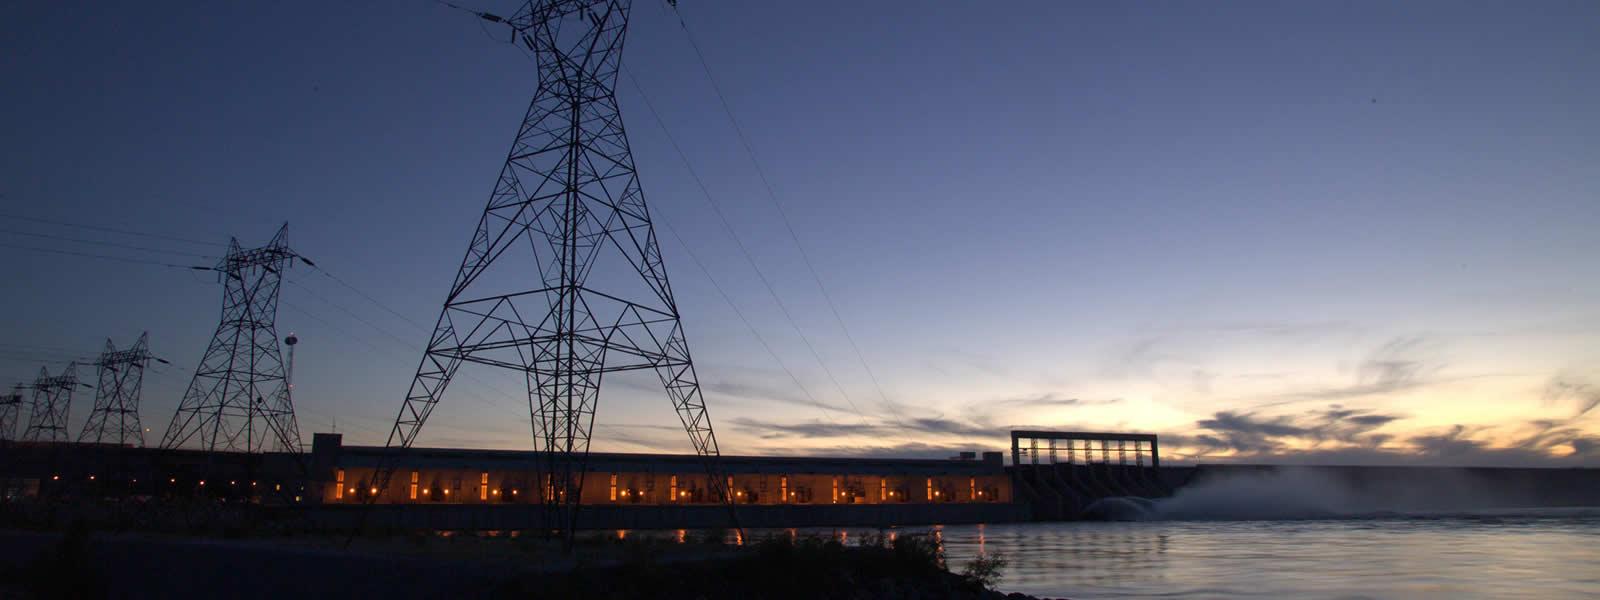 Key Industry: Energy & Environment